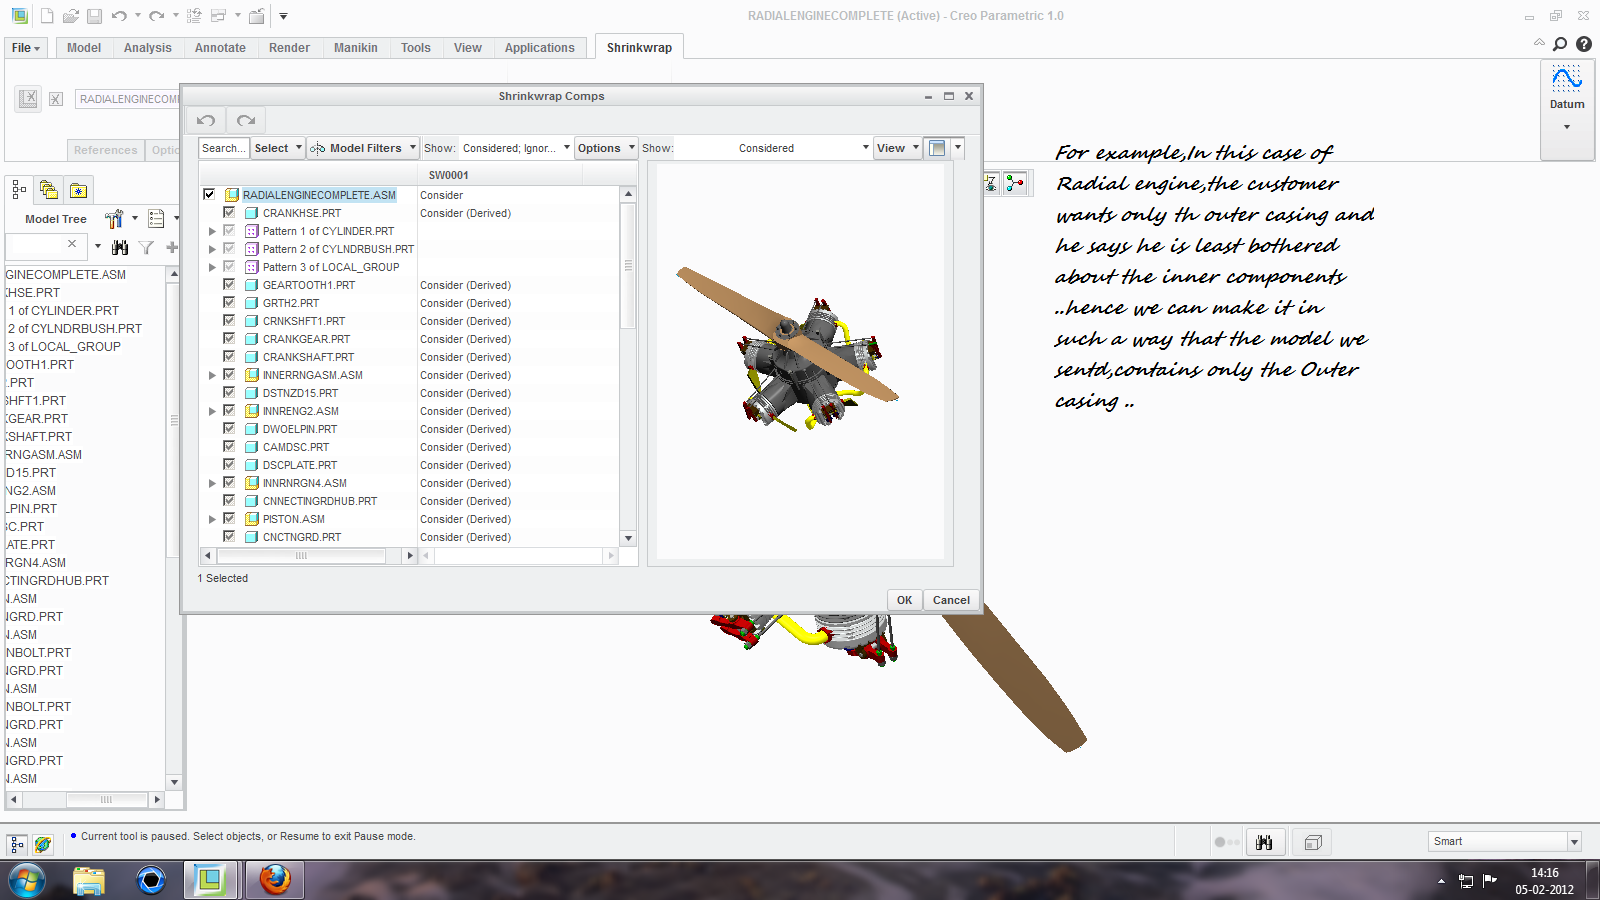 Pro Engineer Wildfire 4.0 Tutorial Pdf